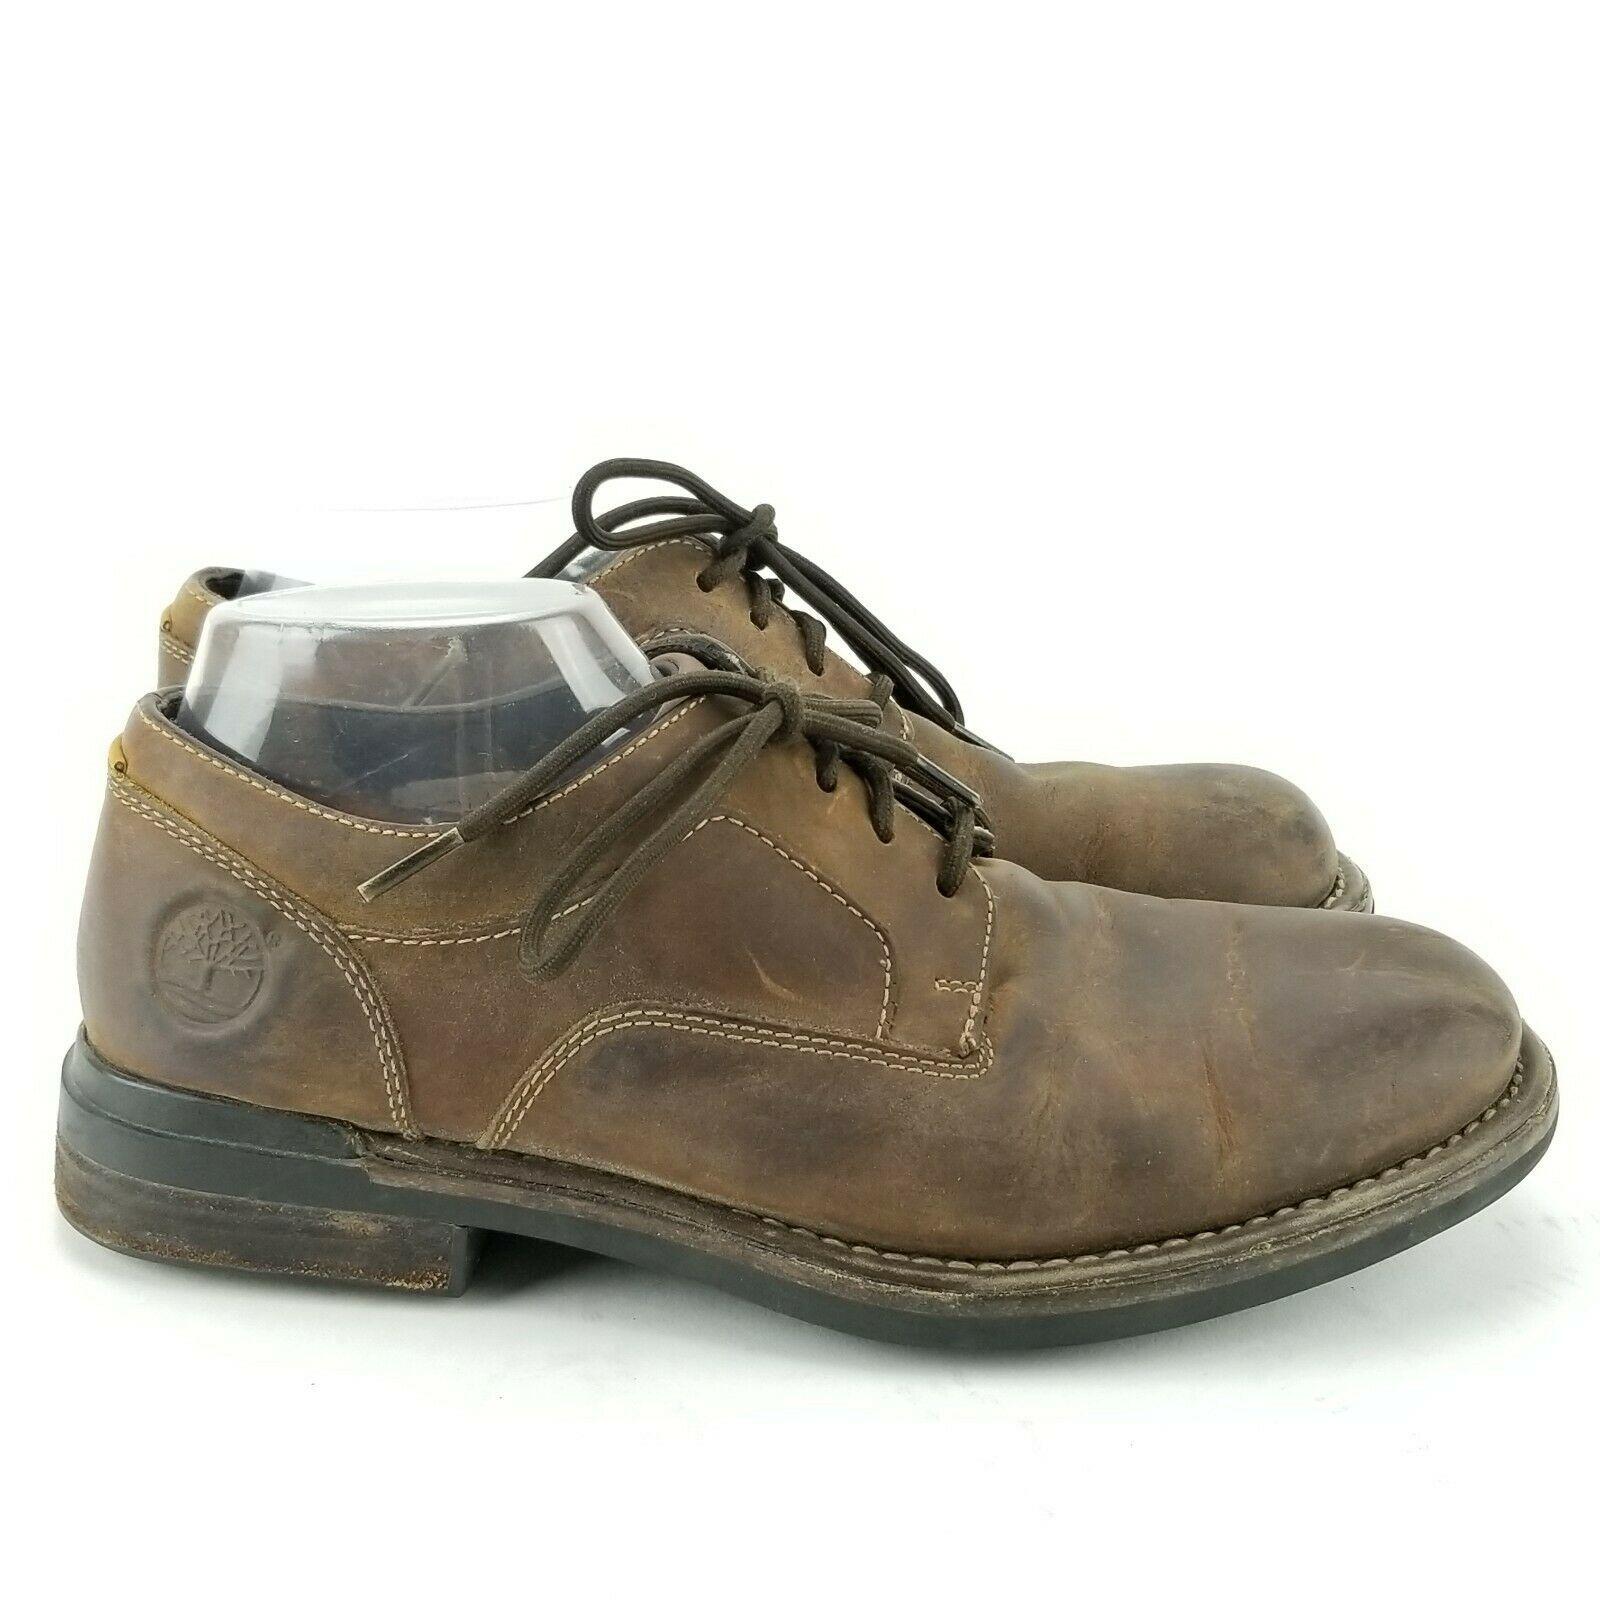 TIMBERLAND Torrance Waterproof Brown Sz 8 M Men Plain-Toe Oxfords